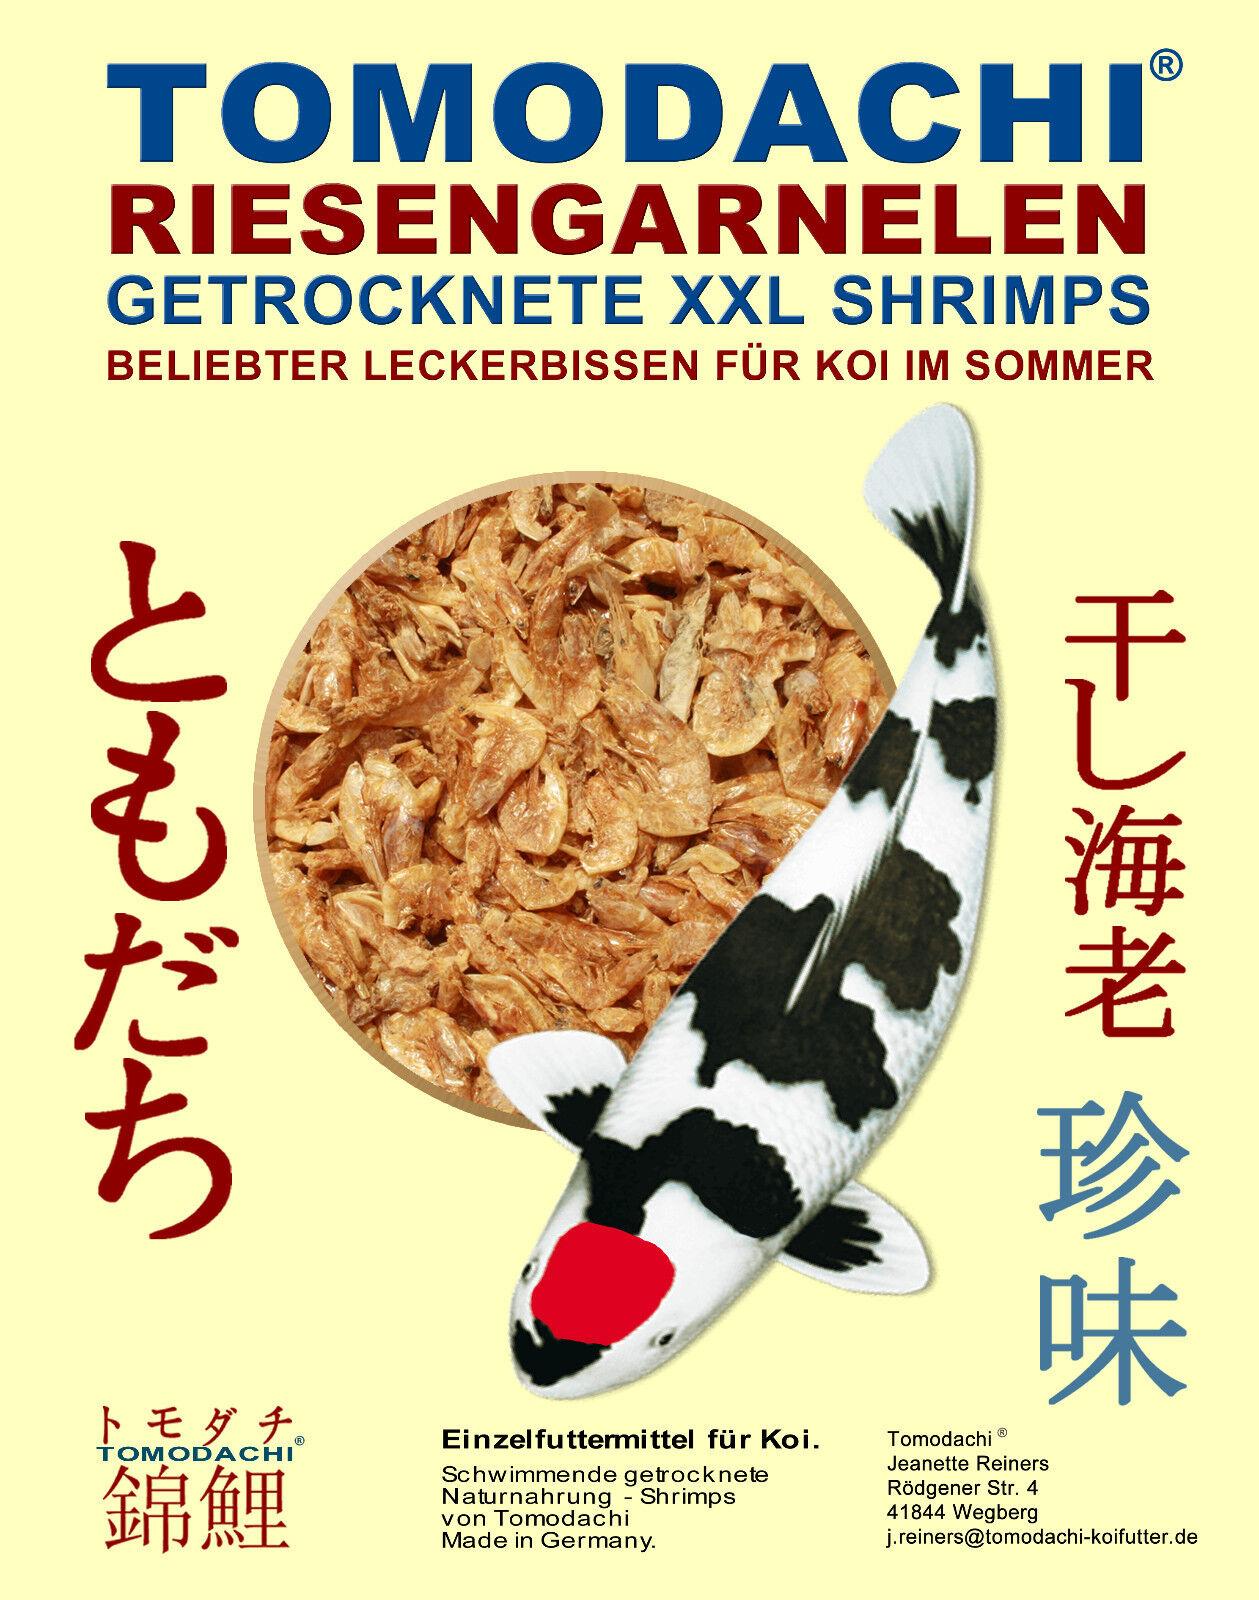 RiesenGarnelen Sommerfutter für Koi Koi Koi +Reptilien Gambas getrocknete Shrimps 5kg 0ce399